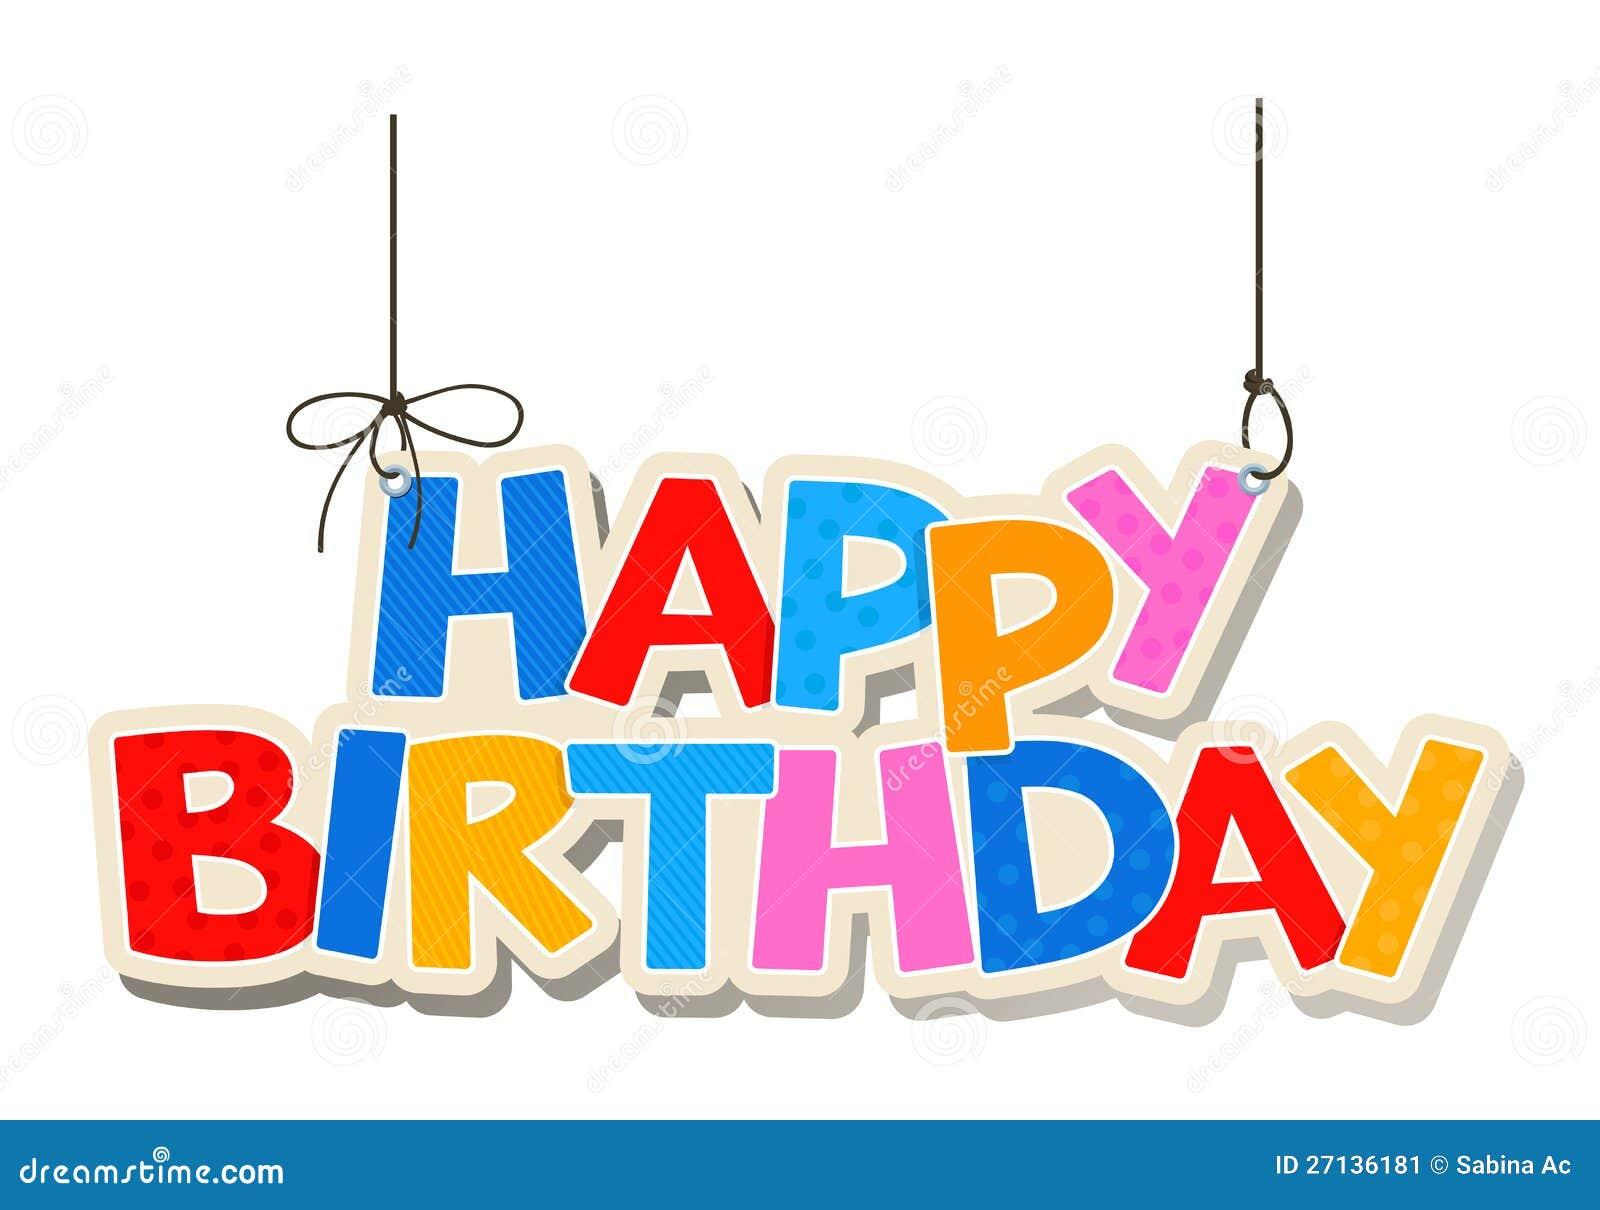 Happy Birthday Greetings Stock Vector Illustration Of Cartoon